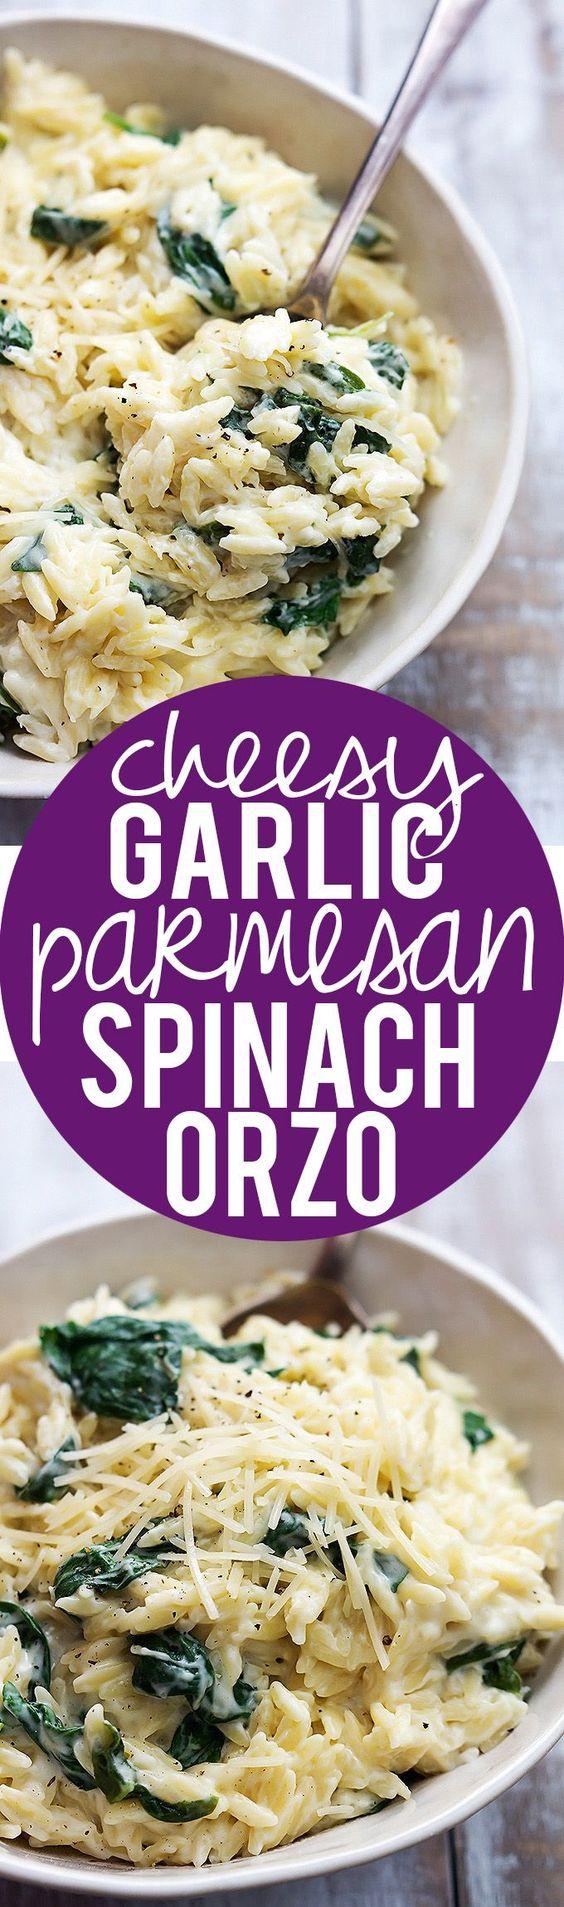 Parmesan orzo, Orzo and Parmesan on Pinterest